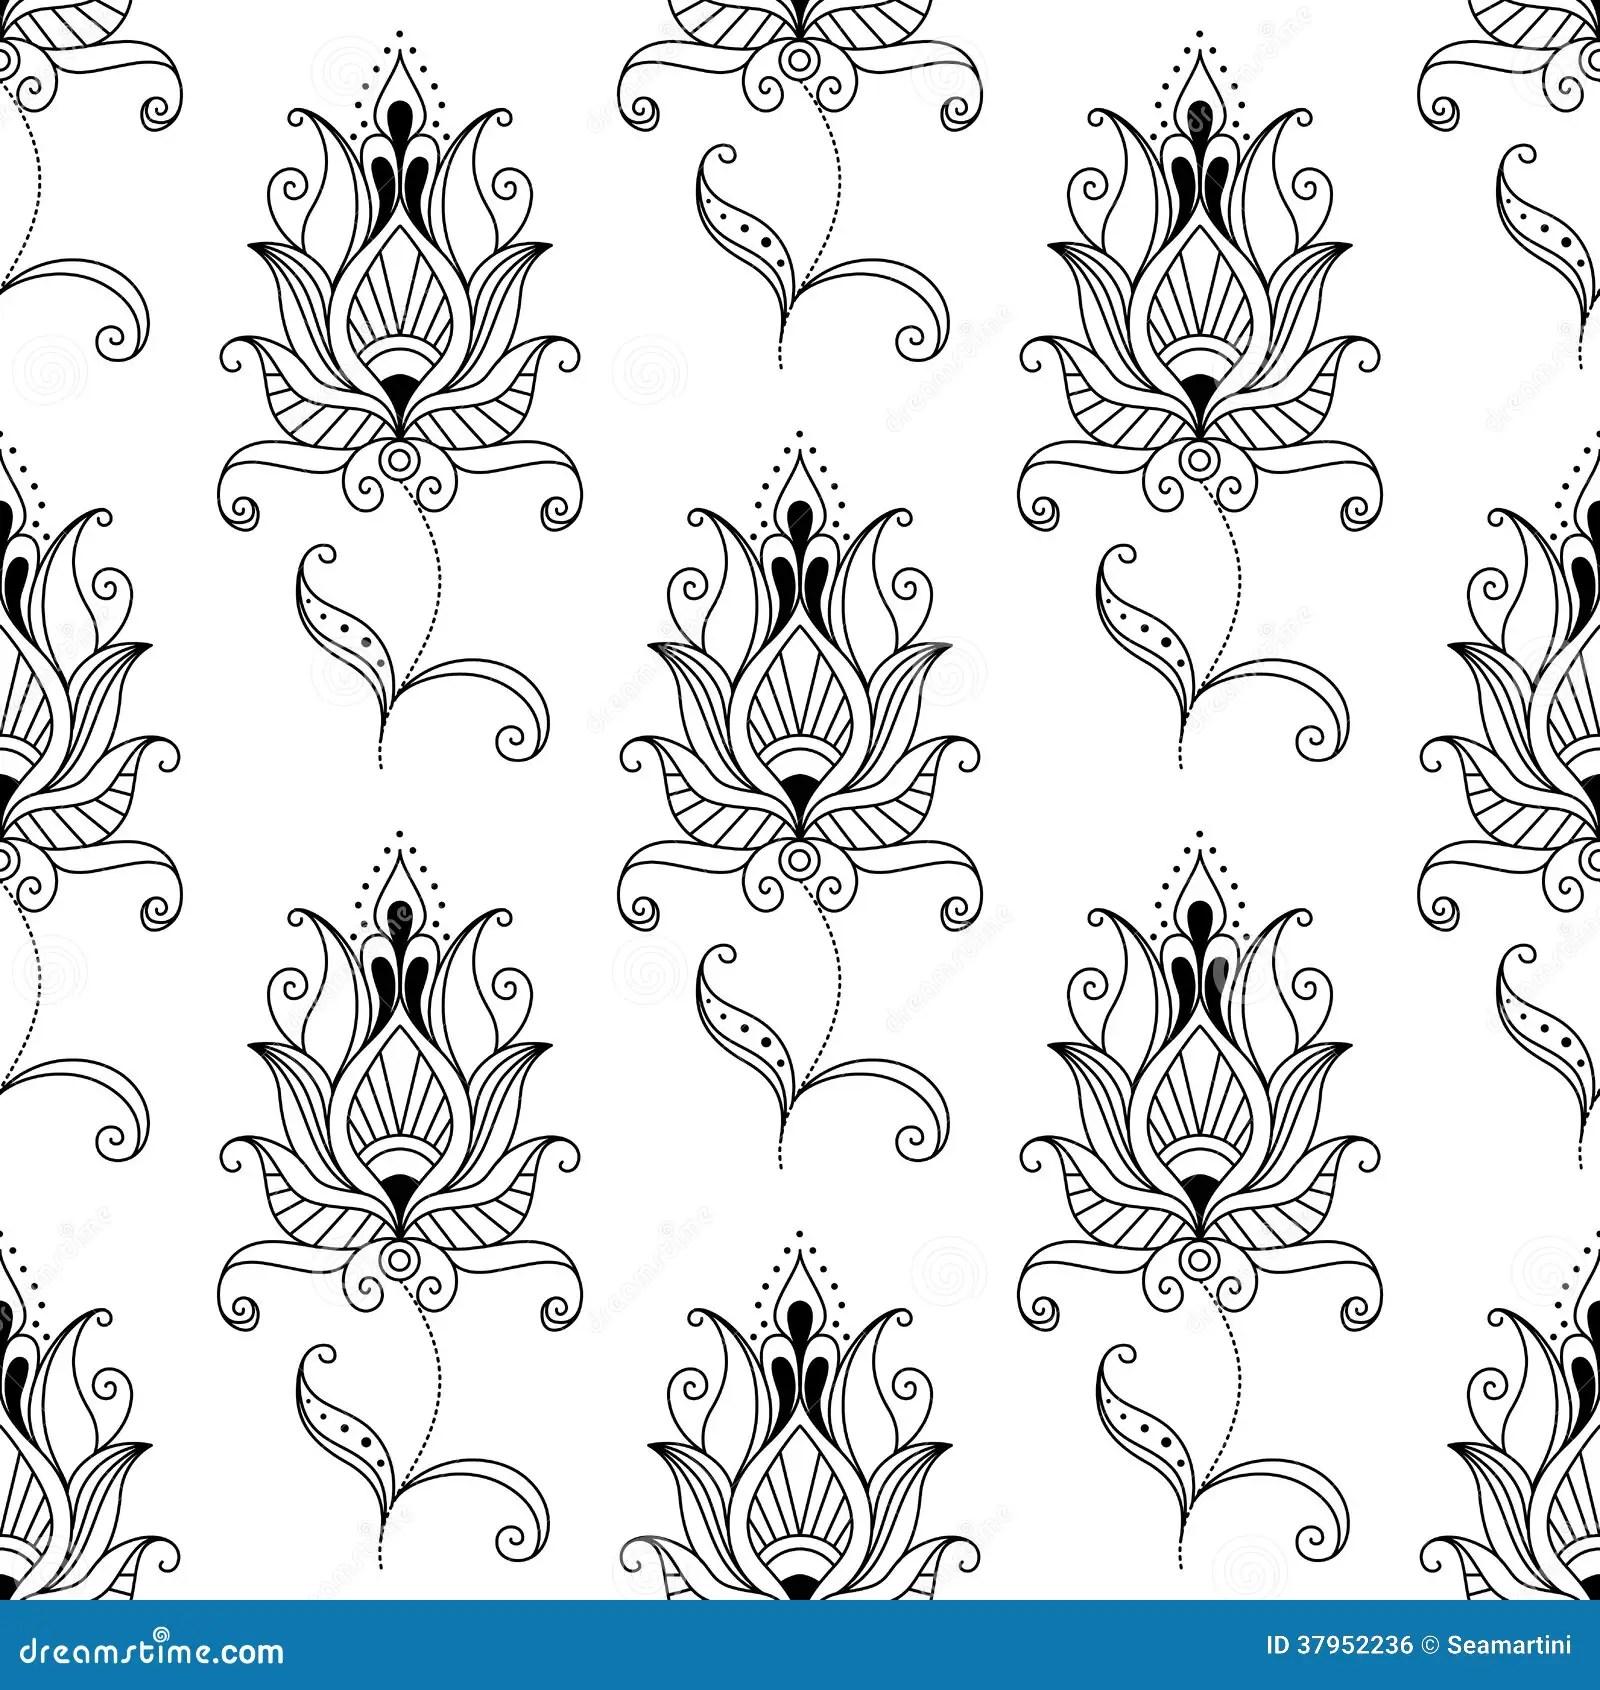 Repeat Seamless Pattern Of Persian Floral Motifs Stock